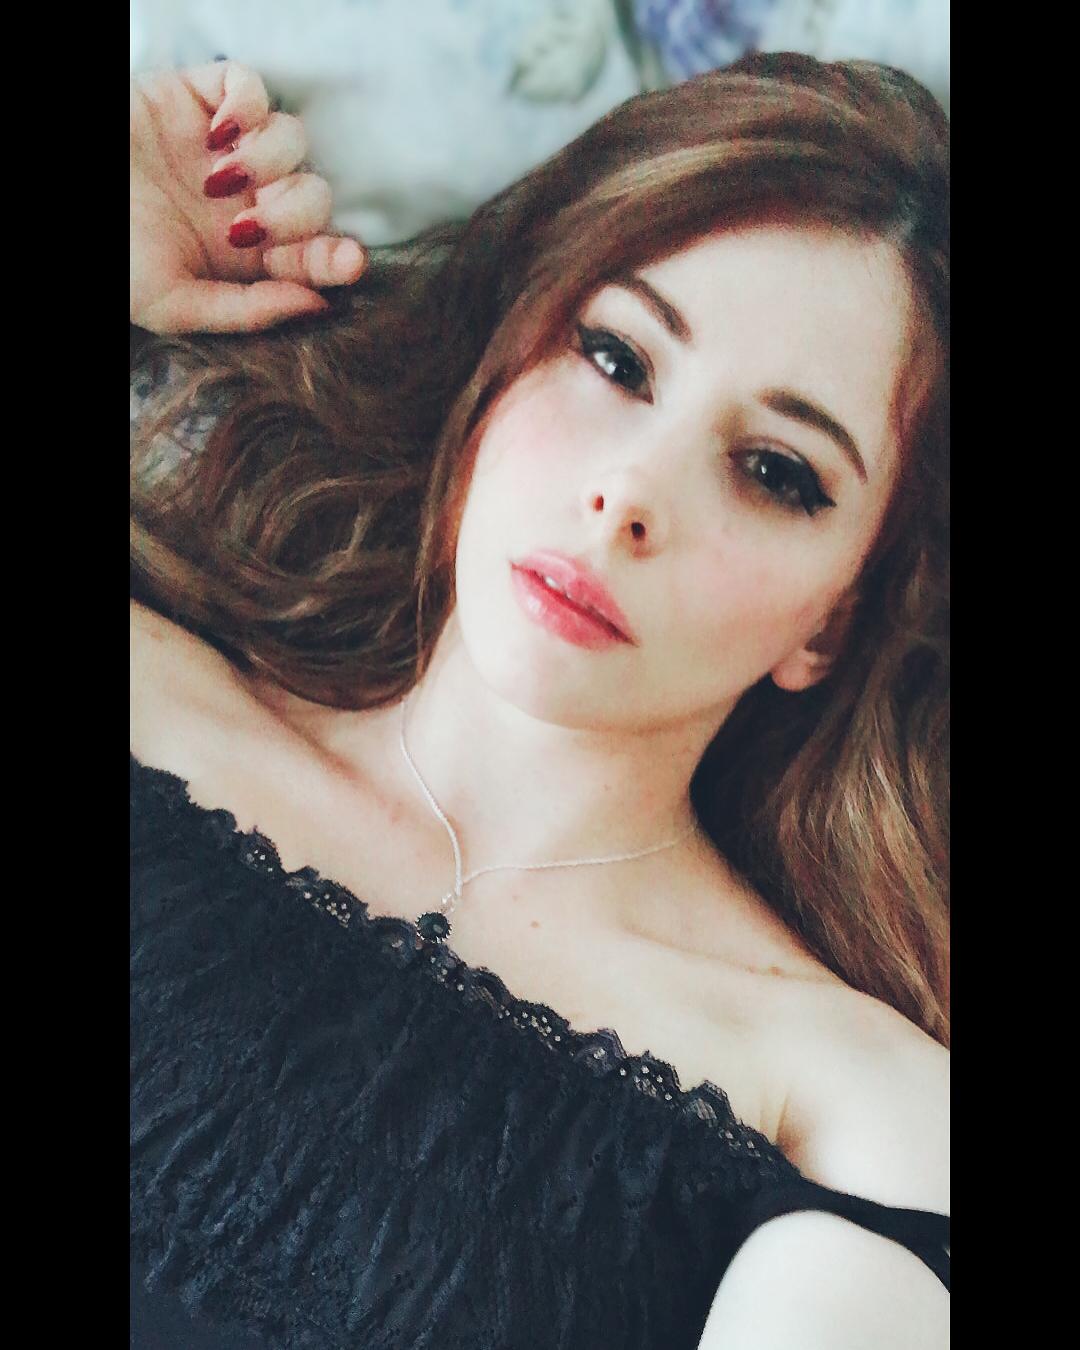 yuriko tiger selfie